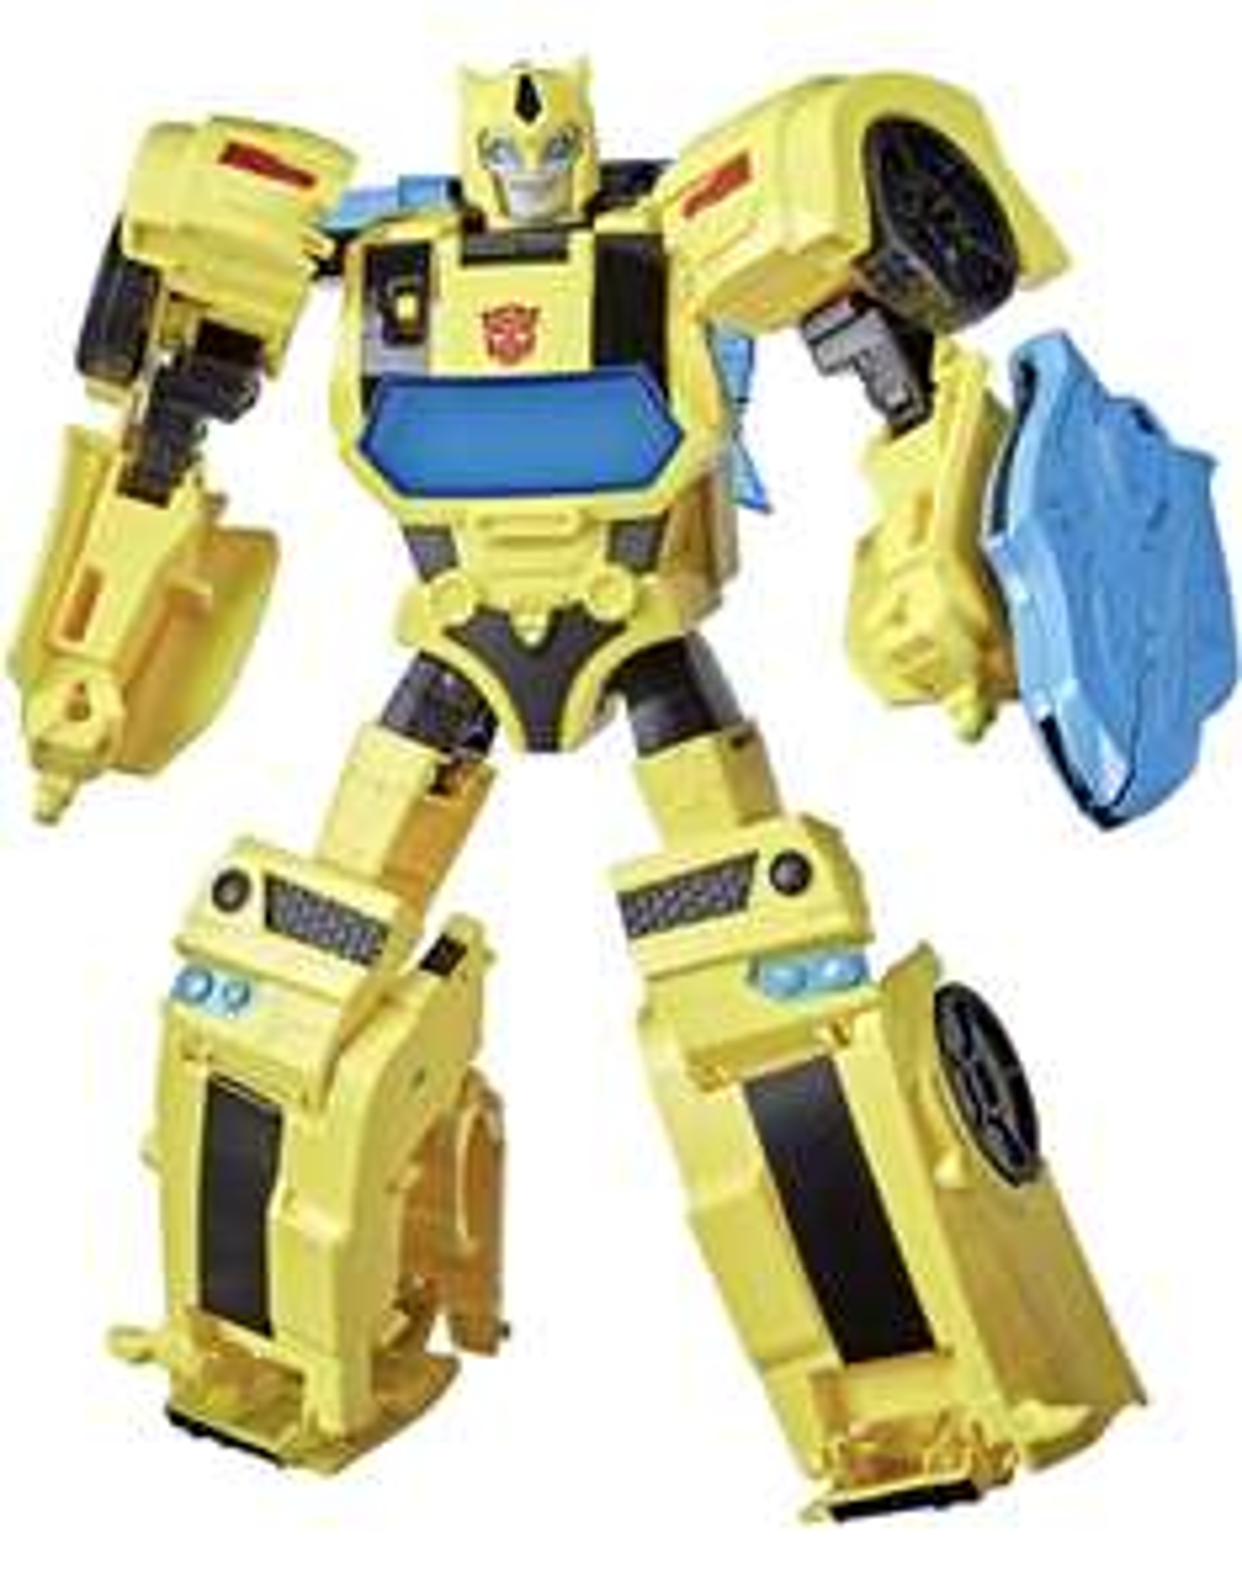 Transformers Bumblebee Cyberverse Adventures Battle Call Officer Class Bumblebee - £33.35 @ Amazon